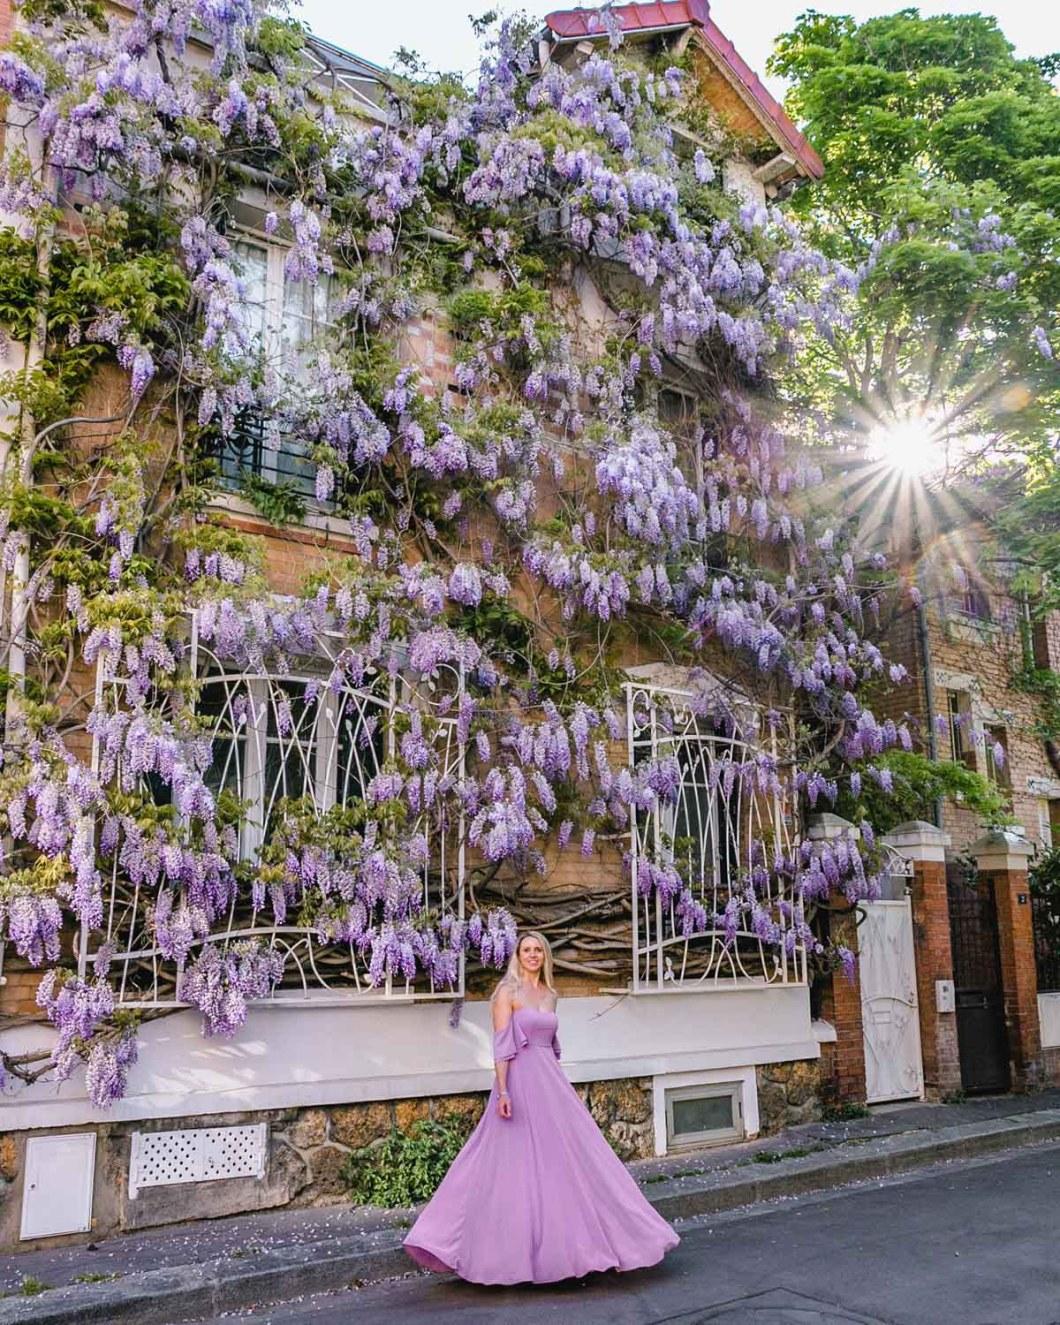 Wisteria in bloom in the Cité Florale - Paris